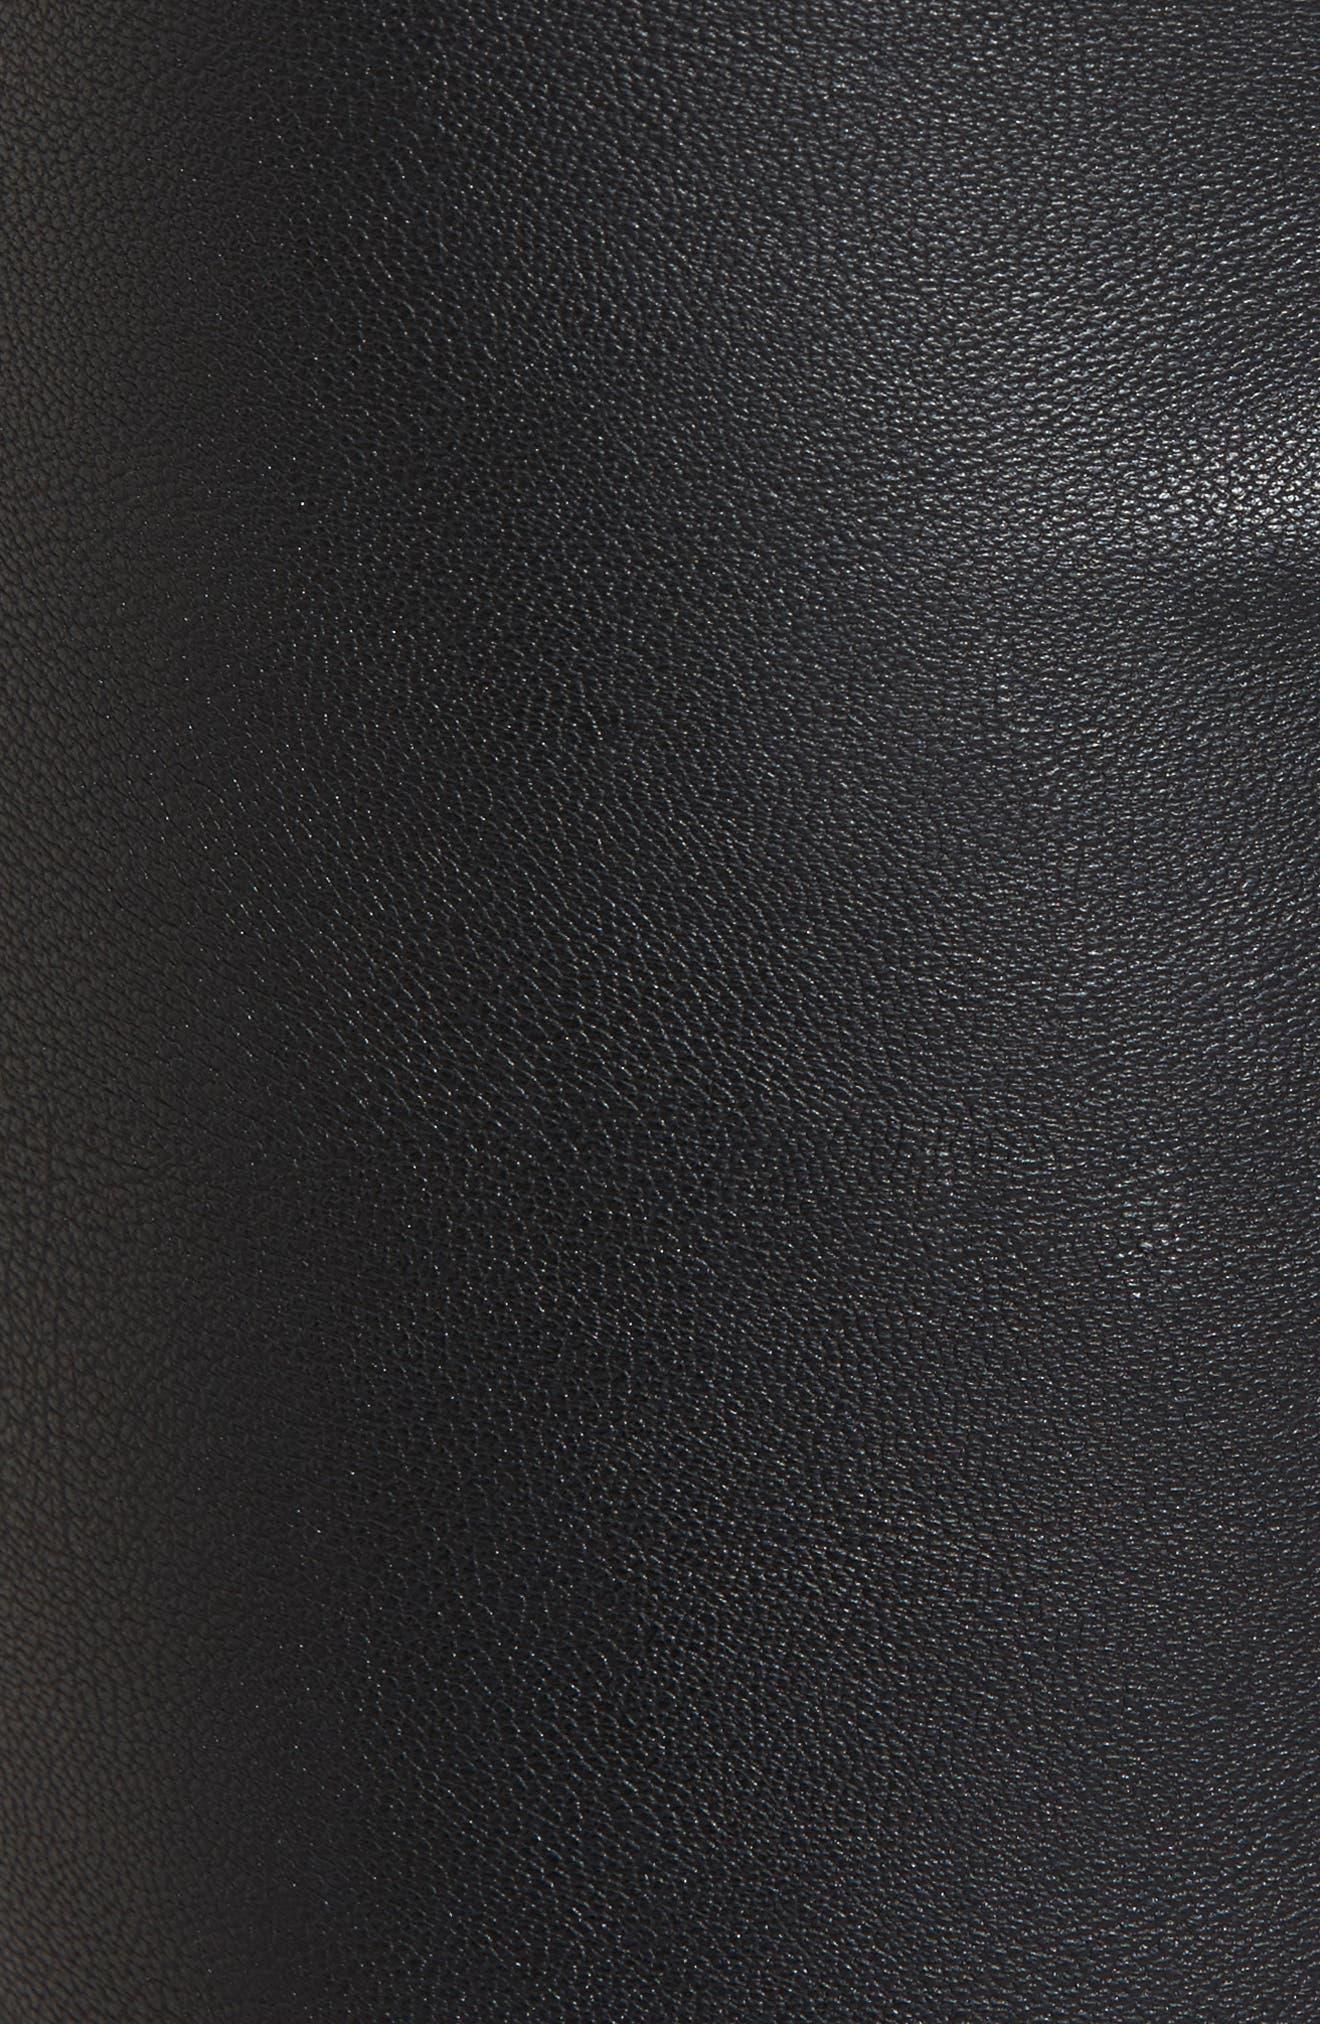 Gemma High Waist Faux Leather Leggings,                             Alternate thumbnail 6, color,                             Black